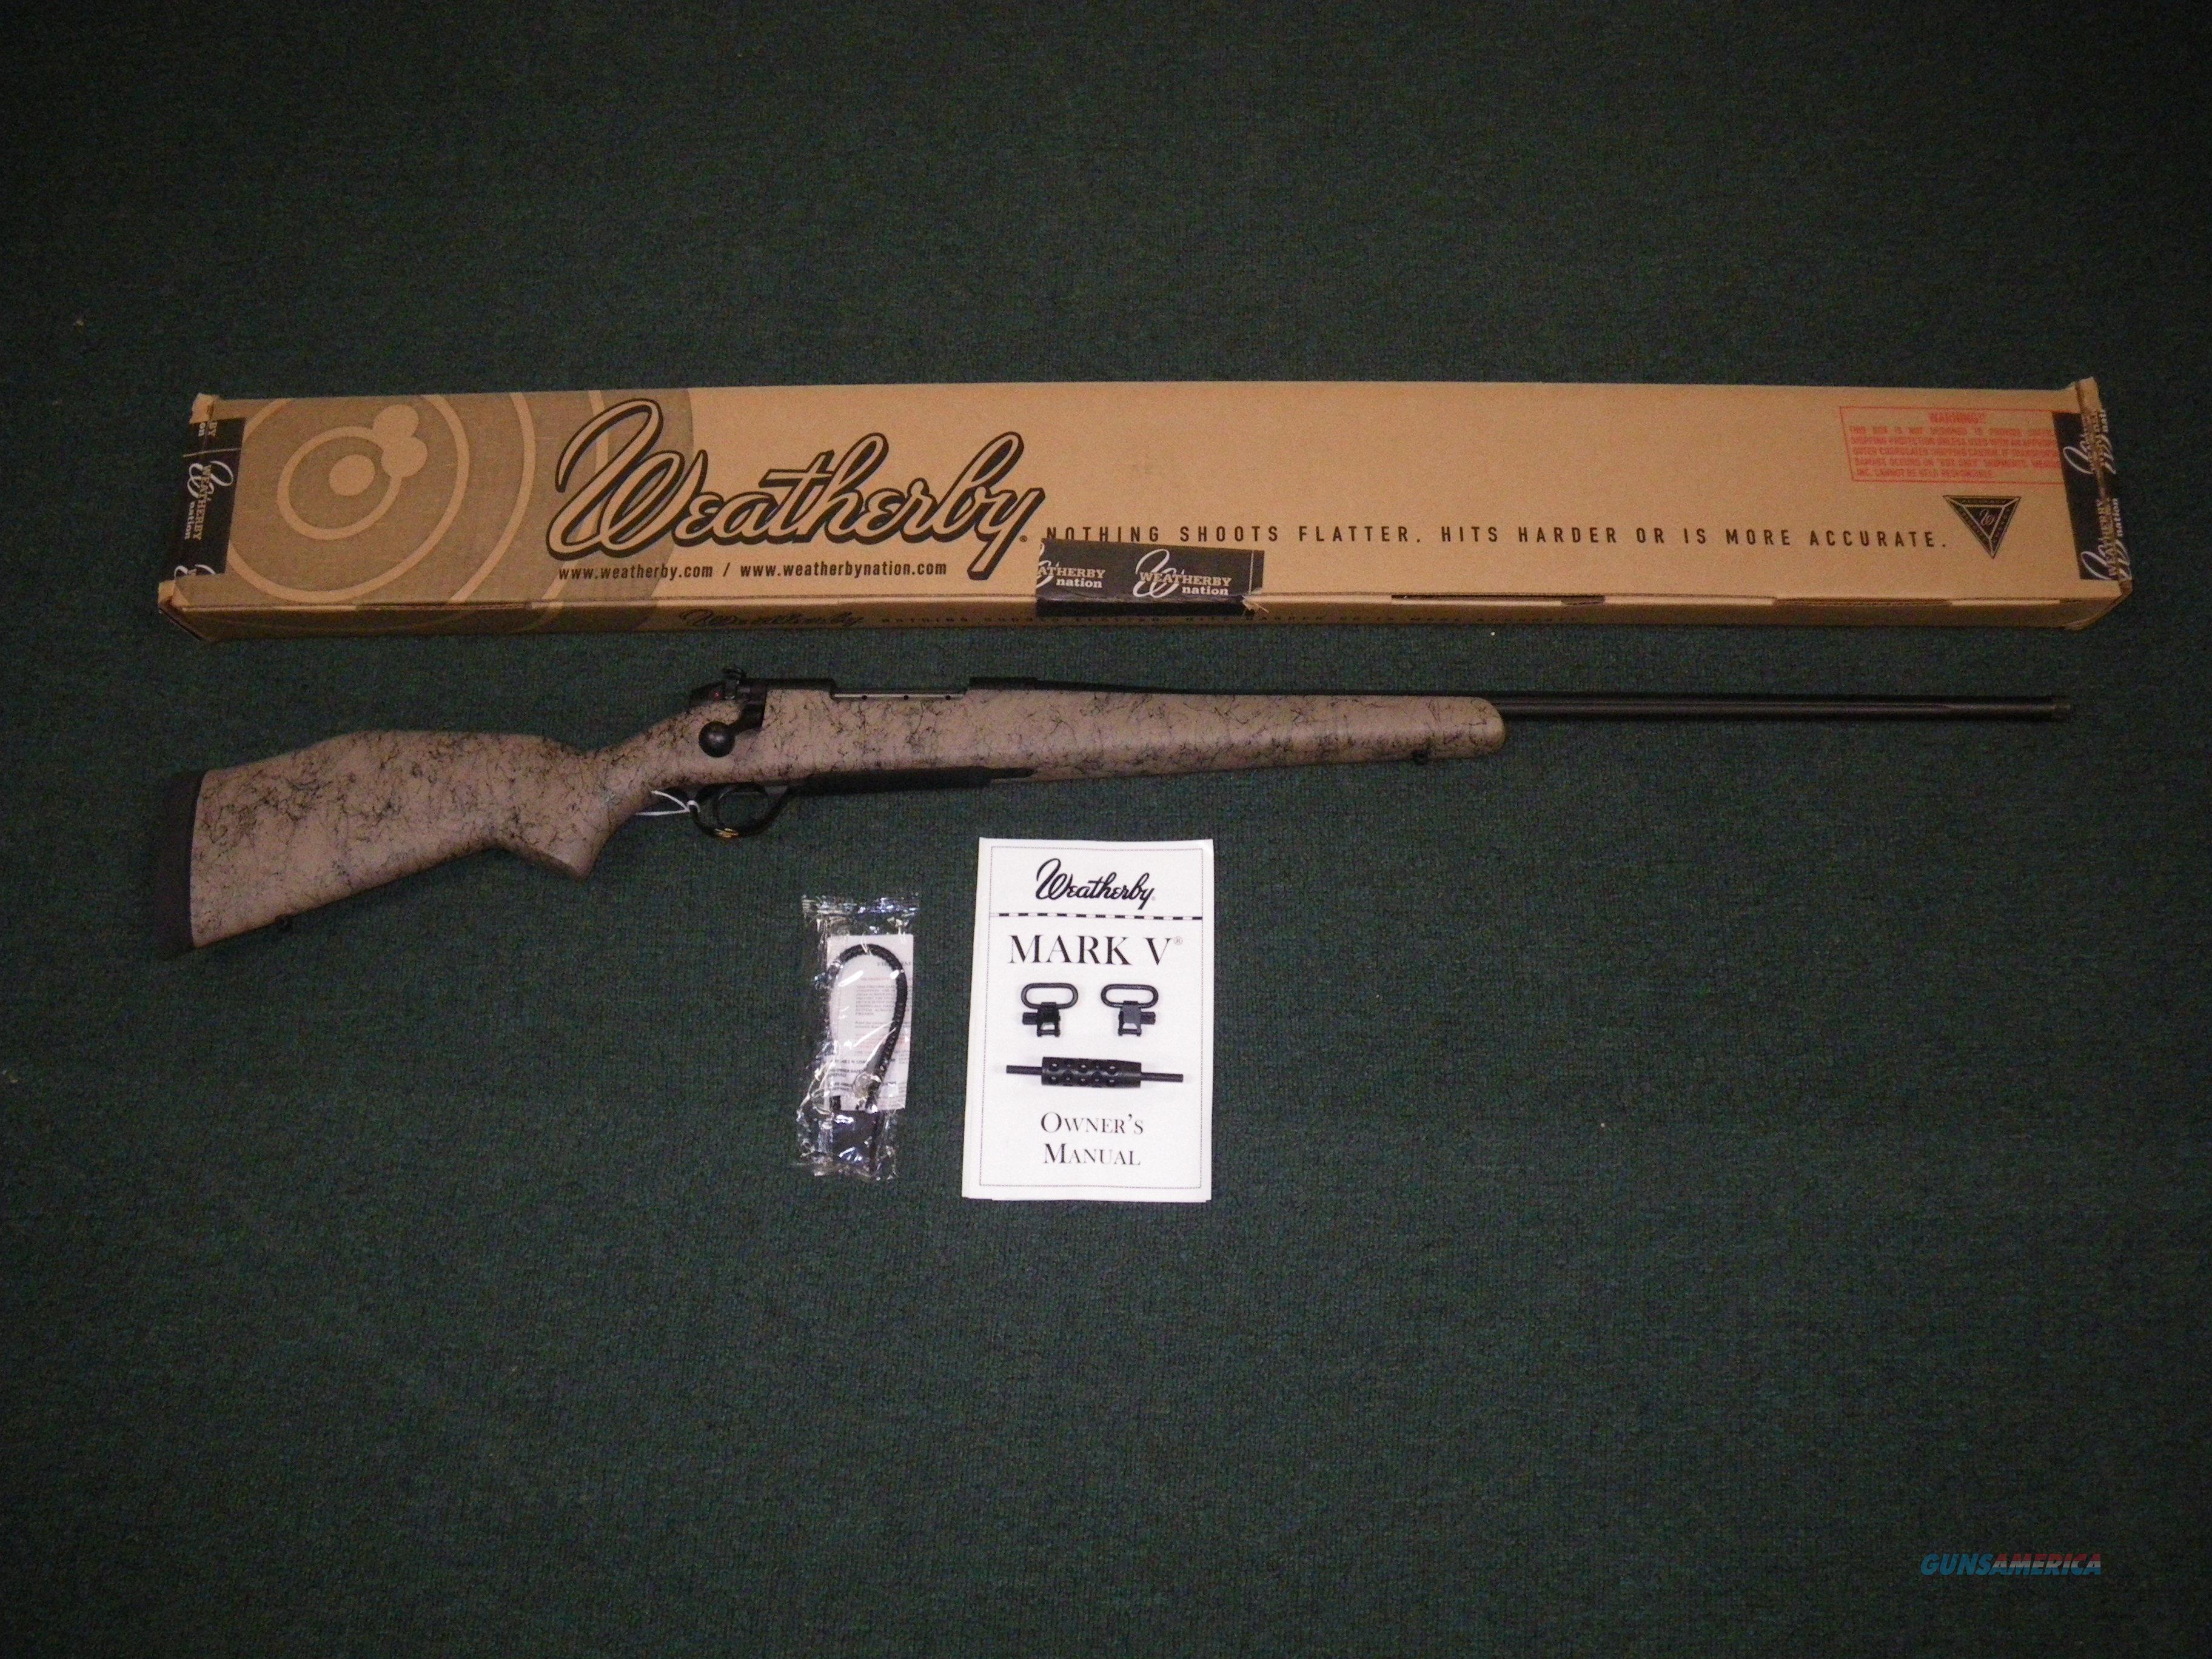 "Weatherby Mark V Ultra Ltwt 6.5-300 Wby Mag 28"" NEW #MUTM653WR8B  Guns > Rifles > Weatherby Rifles > Sporting"